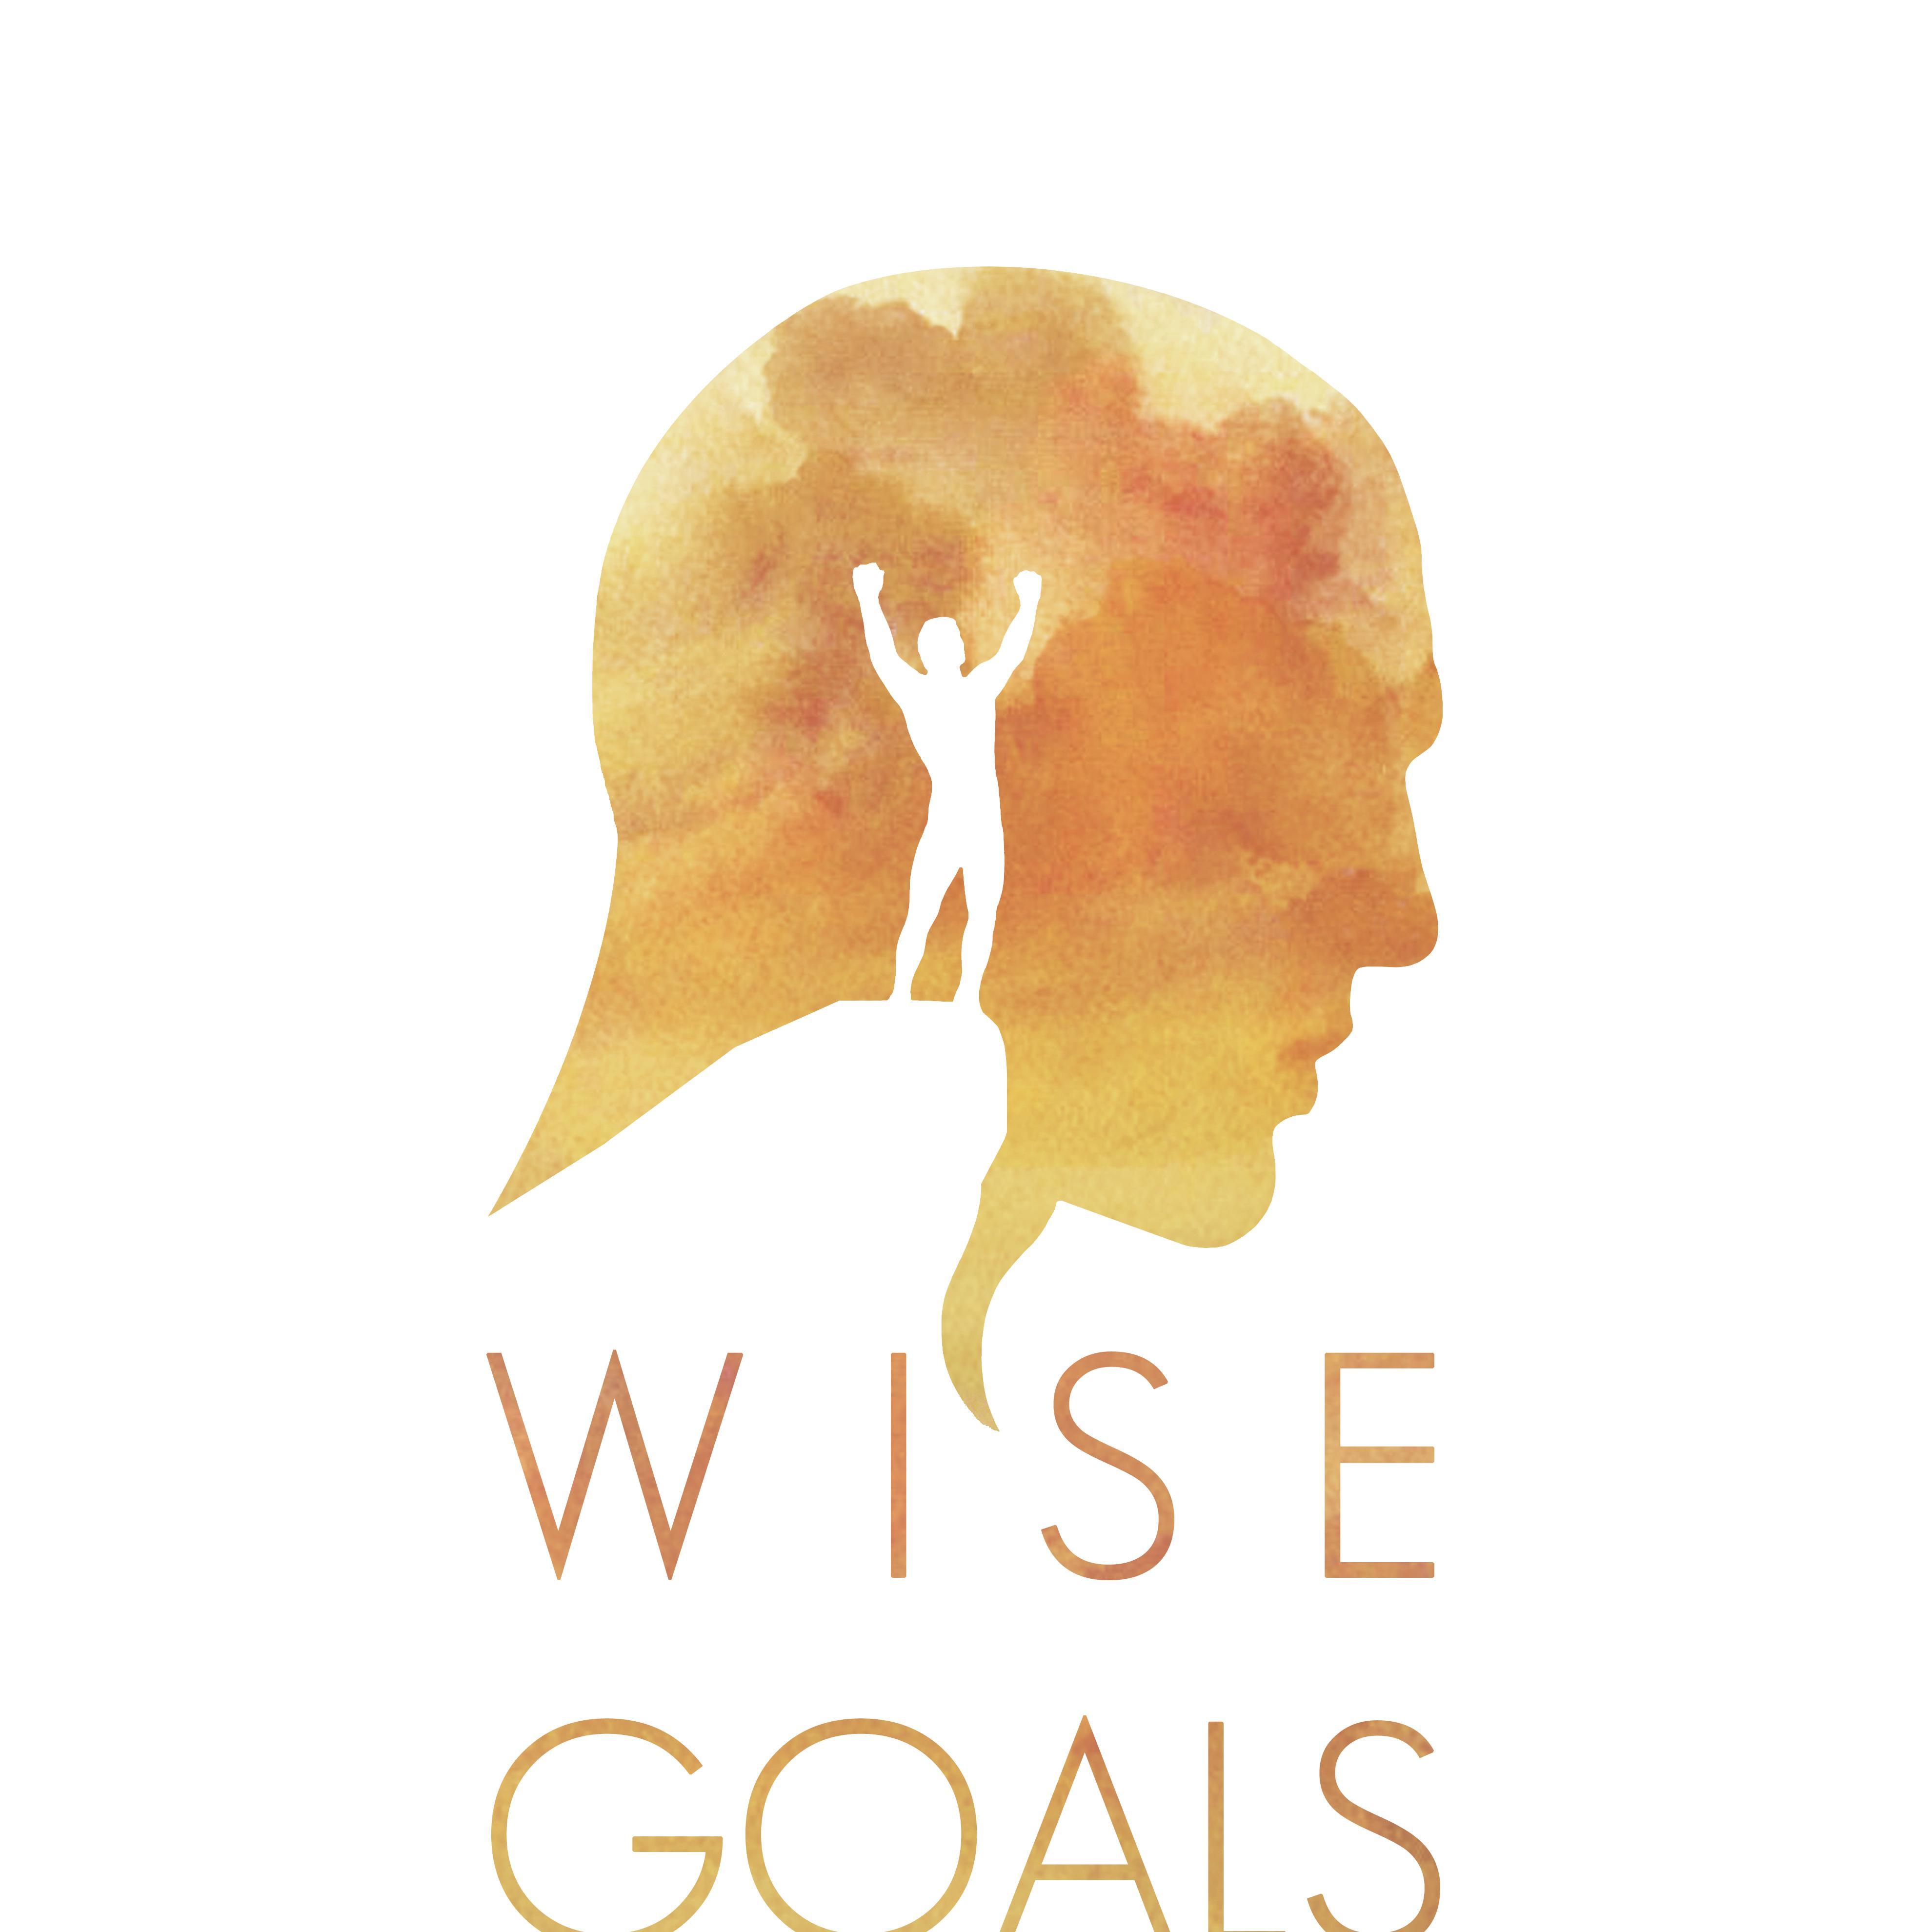 4 Stylish Goal Setting Worksheets To Print